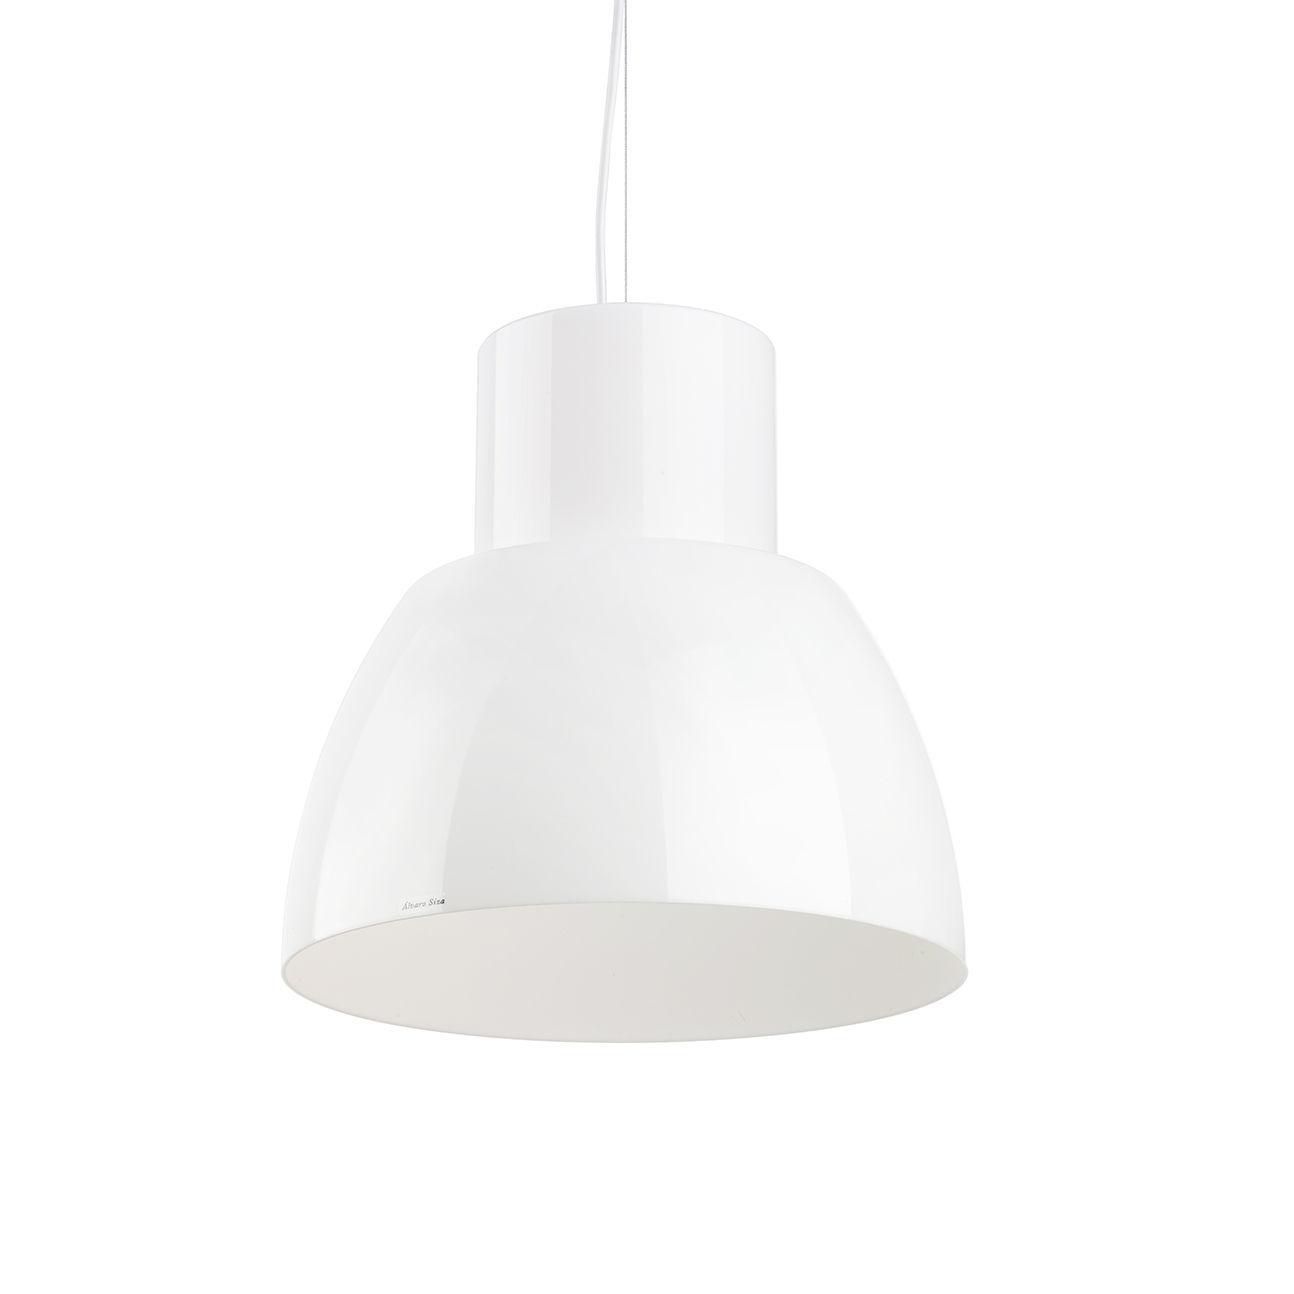 Hanging Light Fixture Lorosae Reggiani Illuminazione Compact Fluorescent Halogen Hid